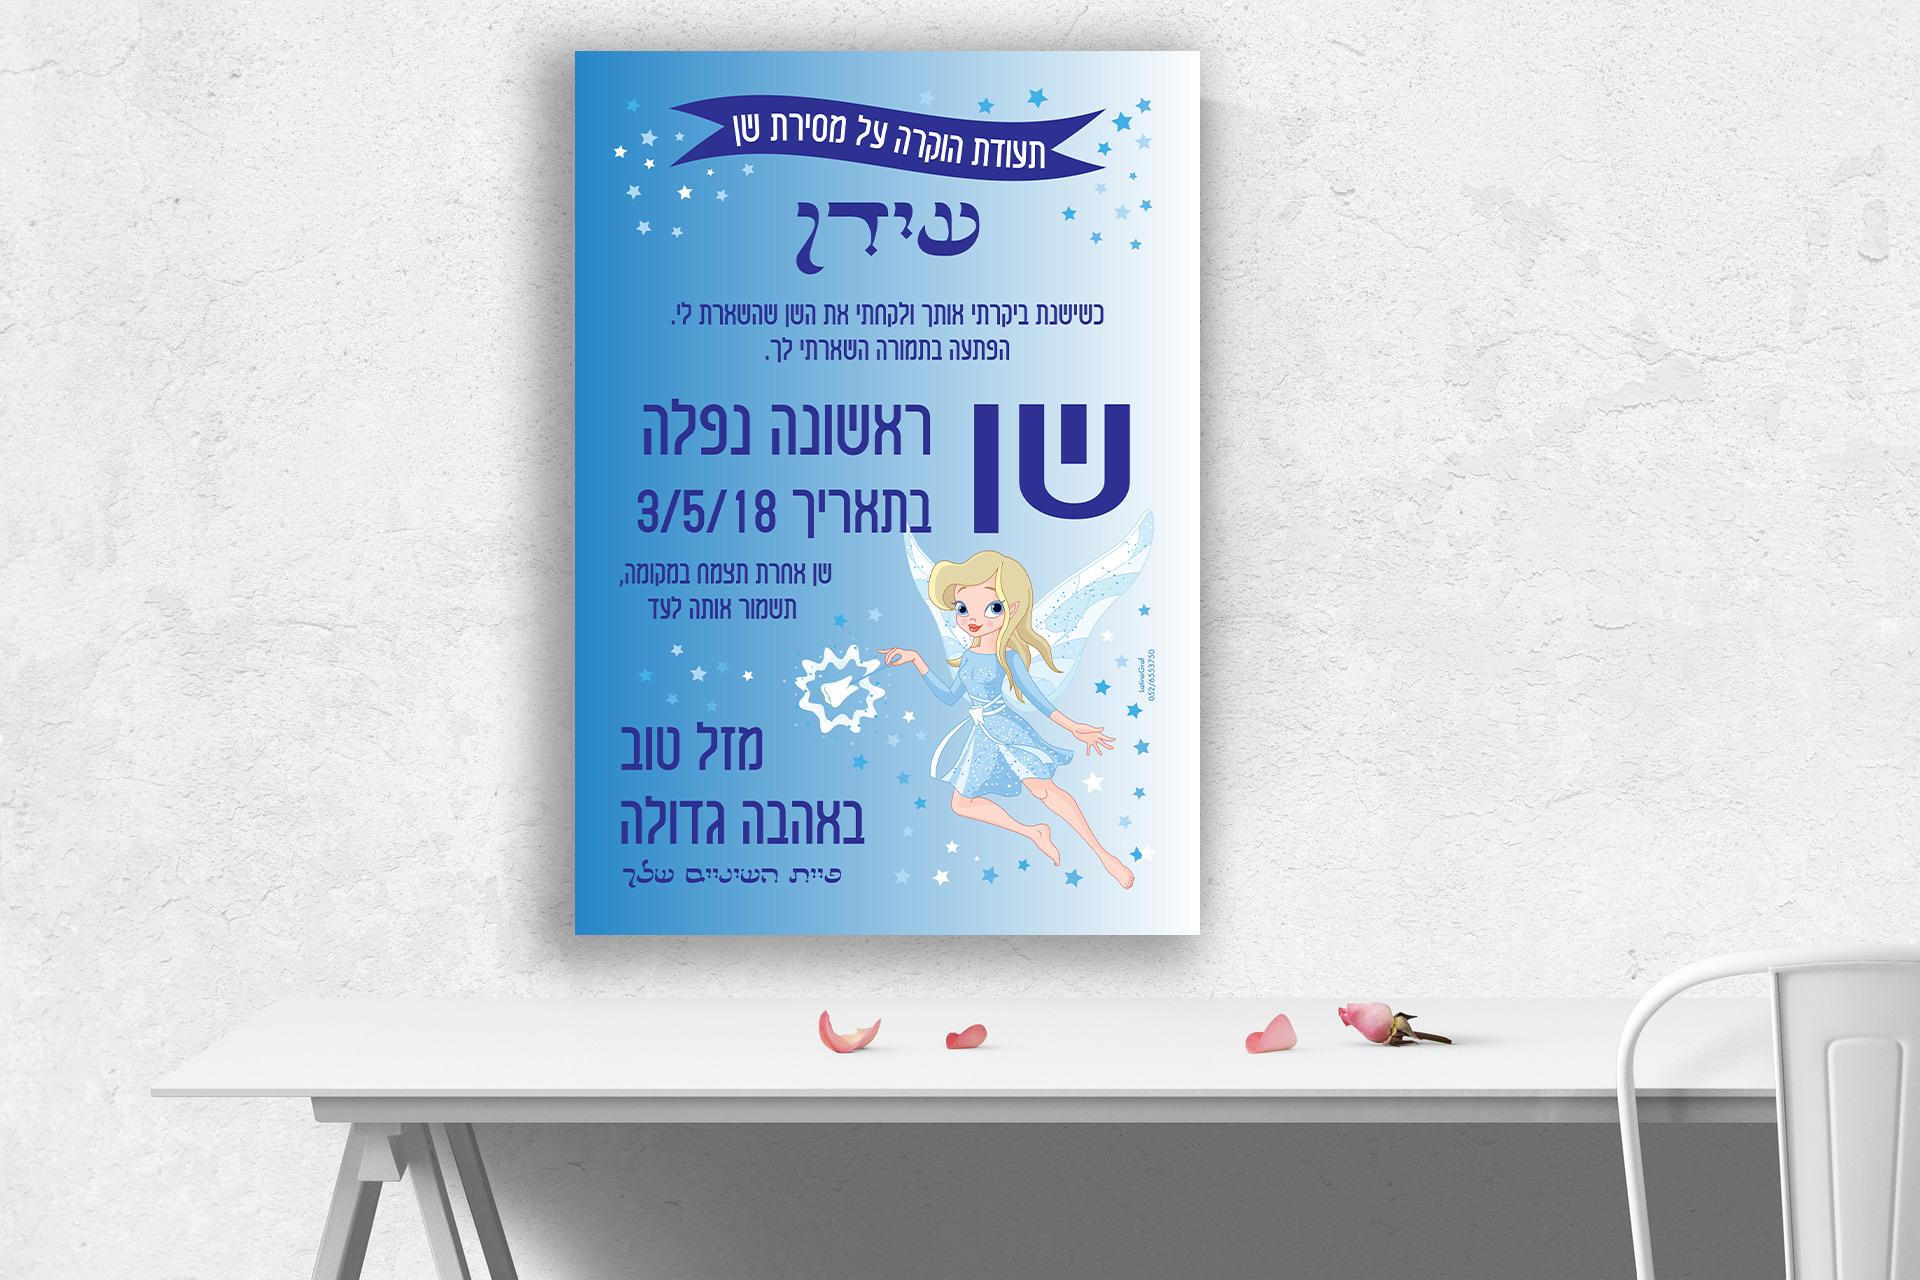 poster-mockup-2853842_1920